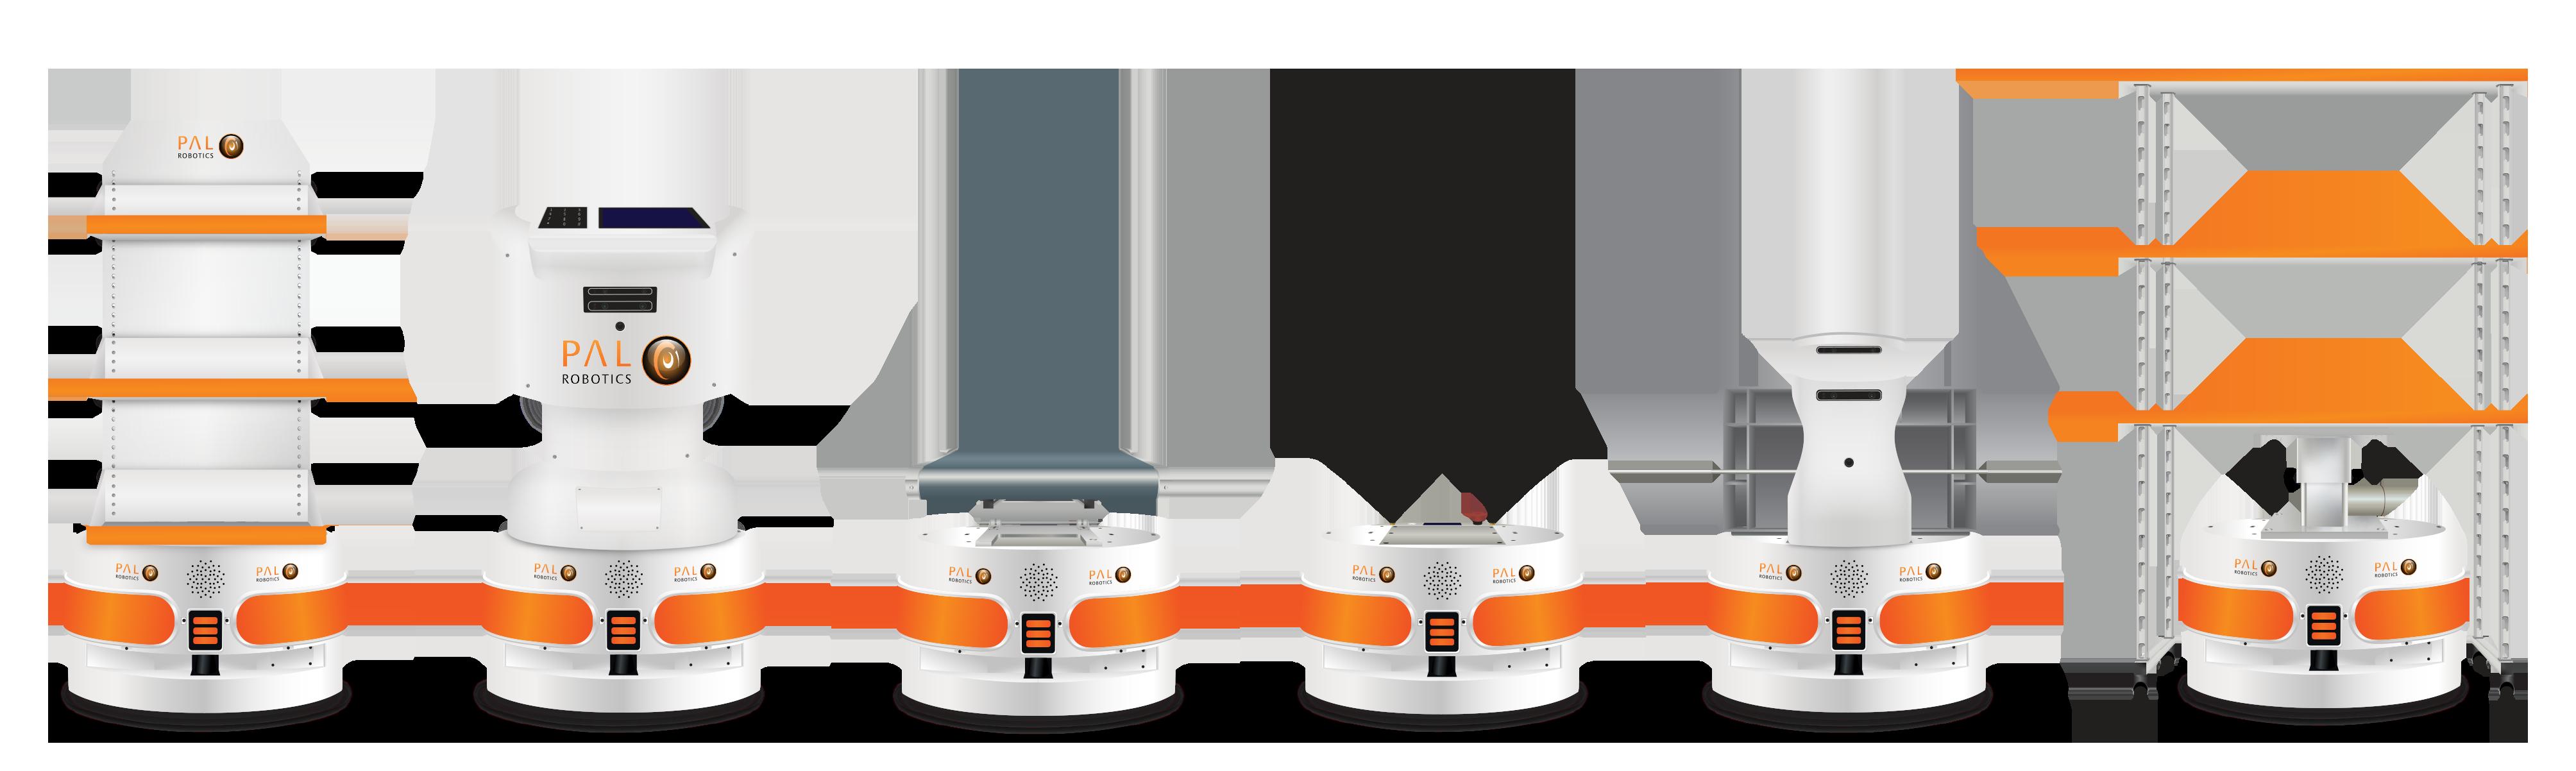 TIAGo Base Configurations